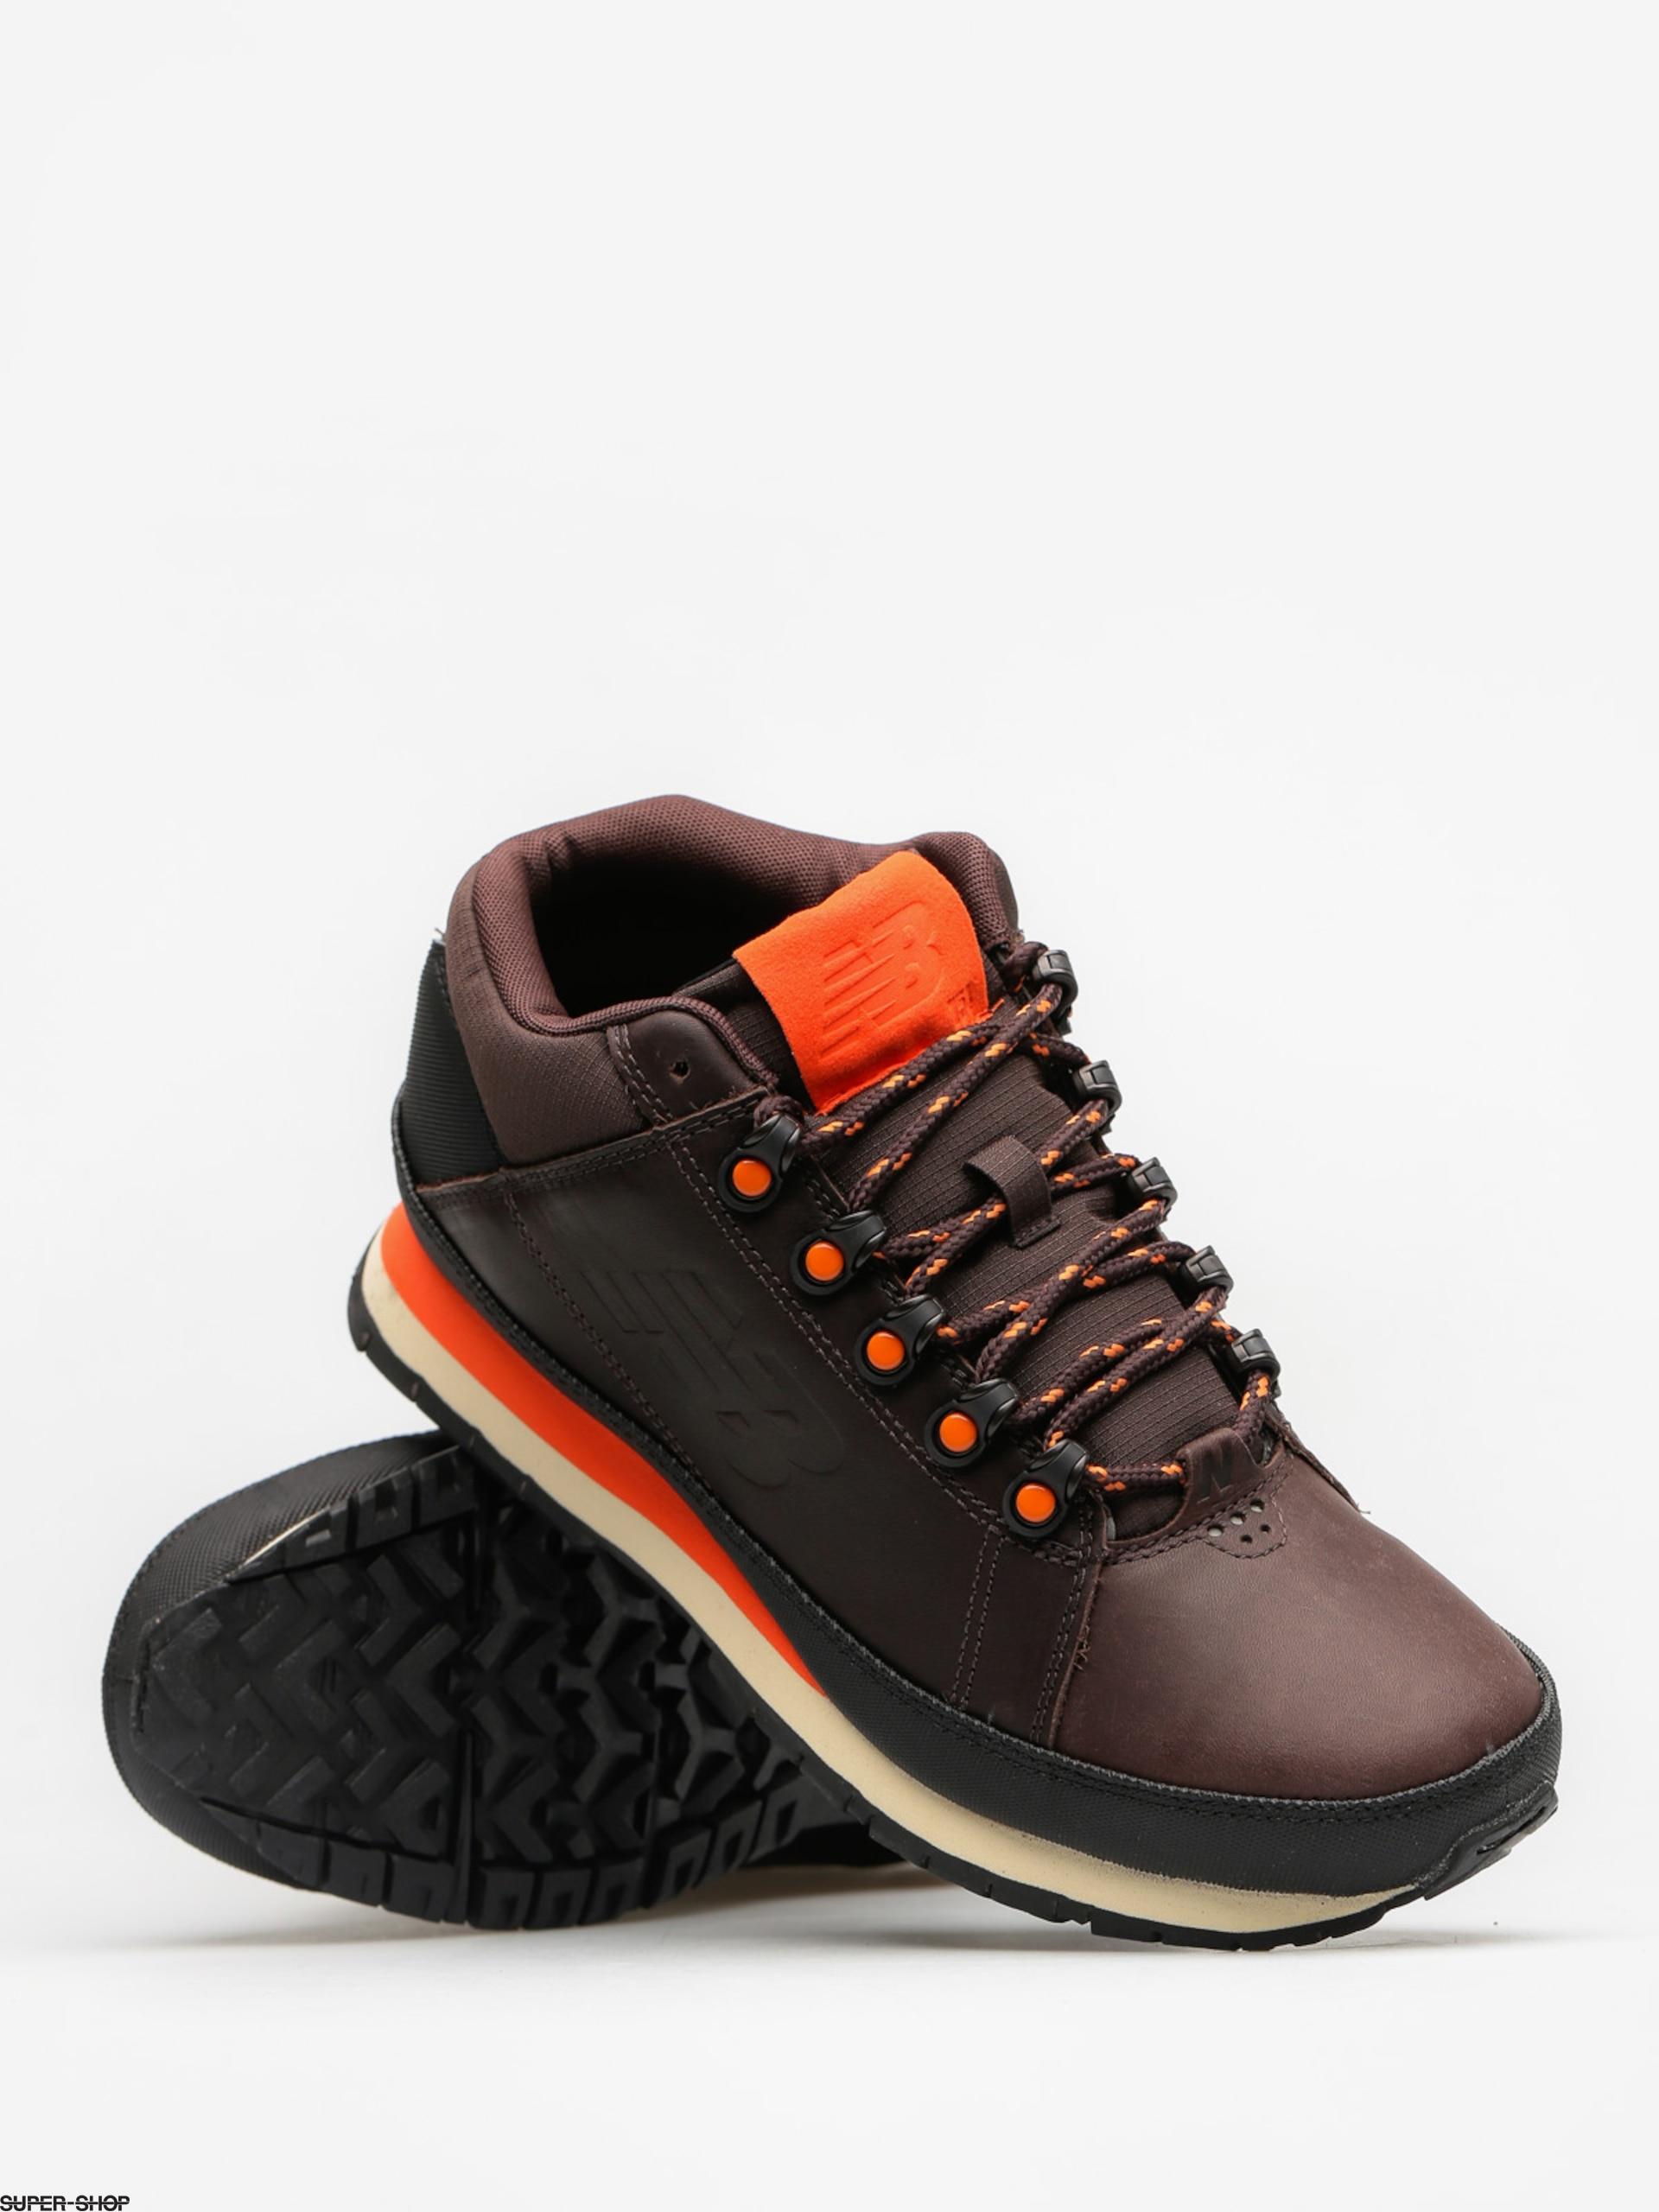 new balance winter shoes